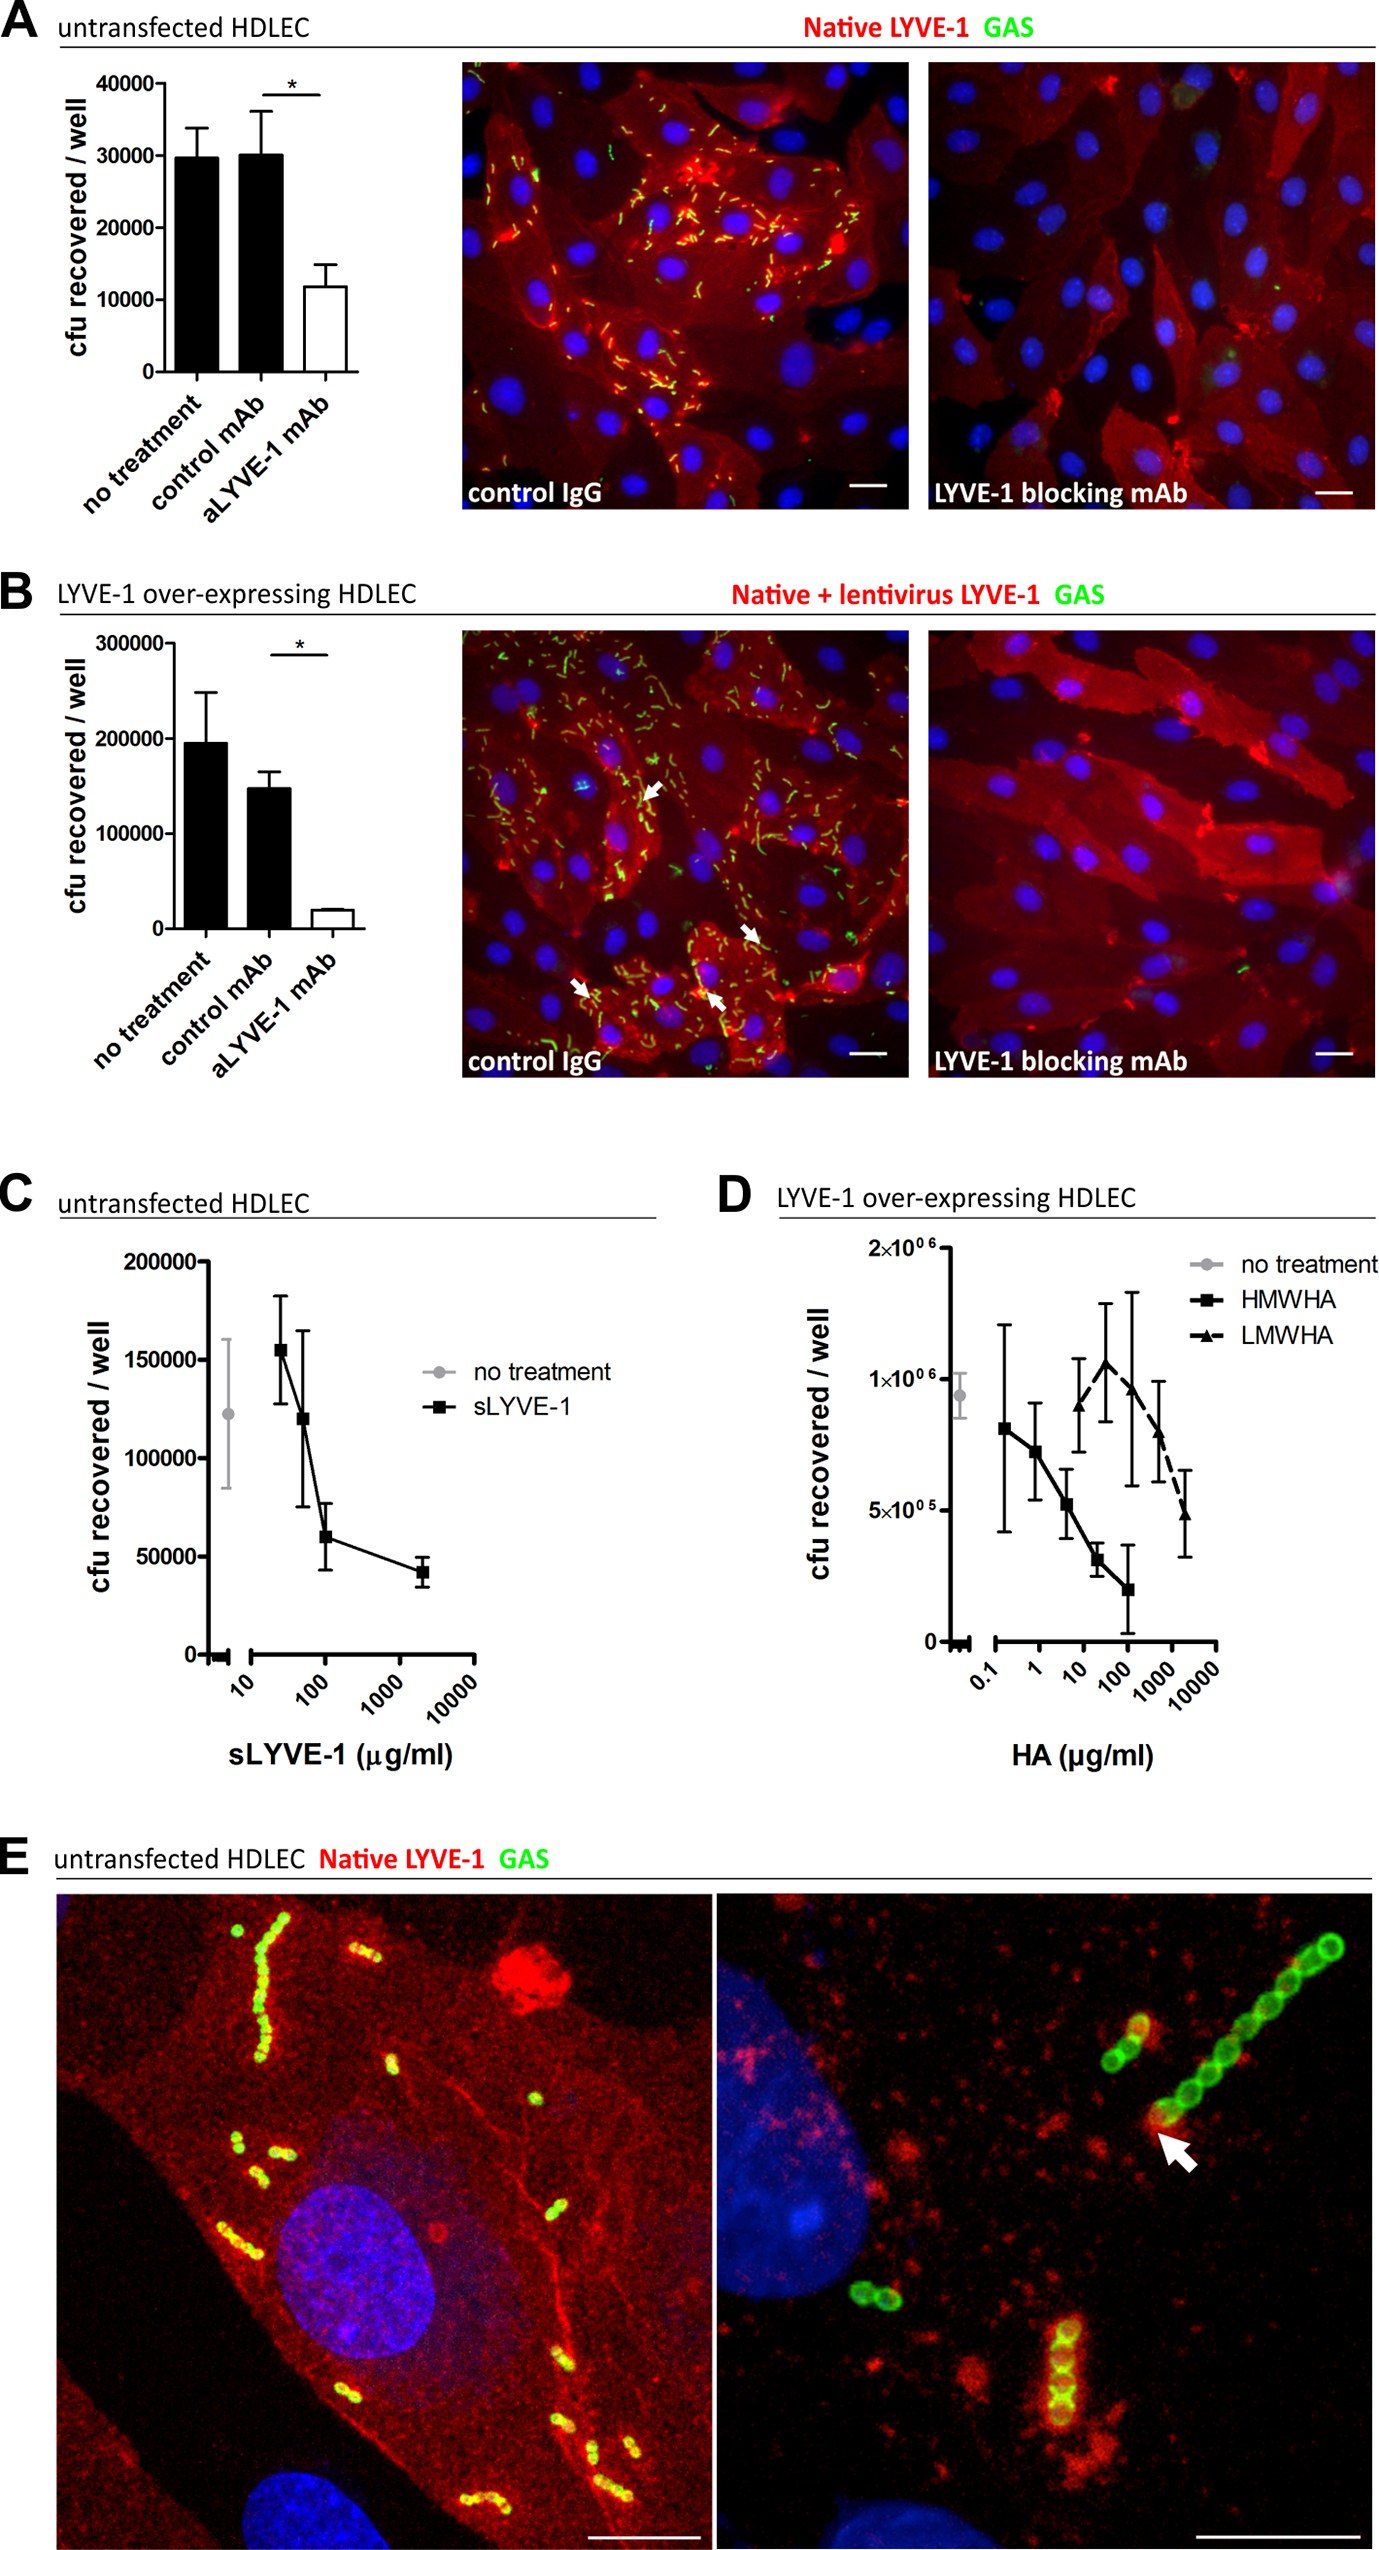 Human LYVE-1 mediates GAS adhesion to HDLEC <i>via</i> capsular HA.